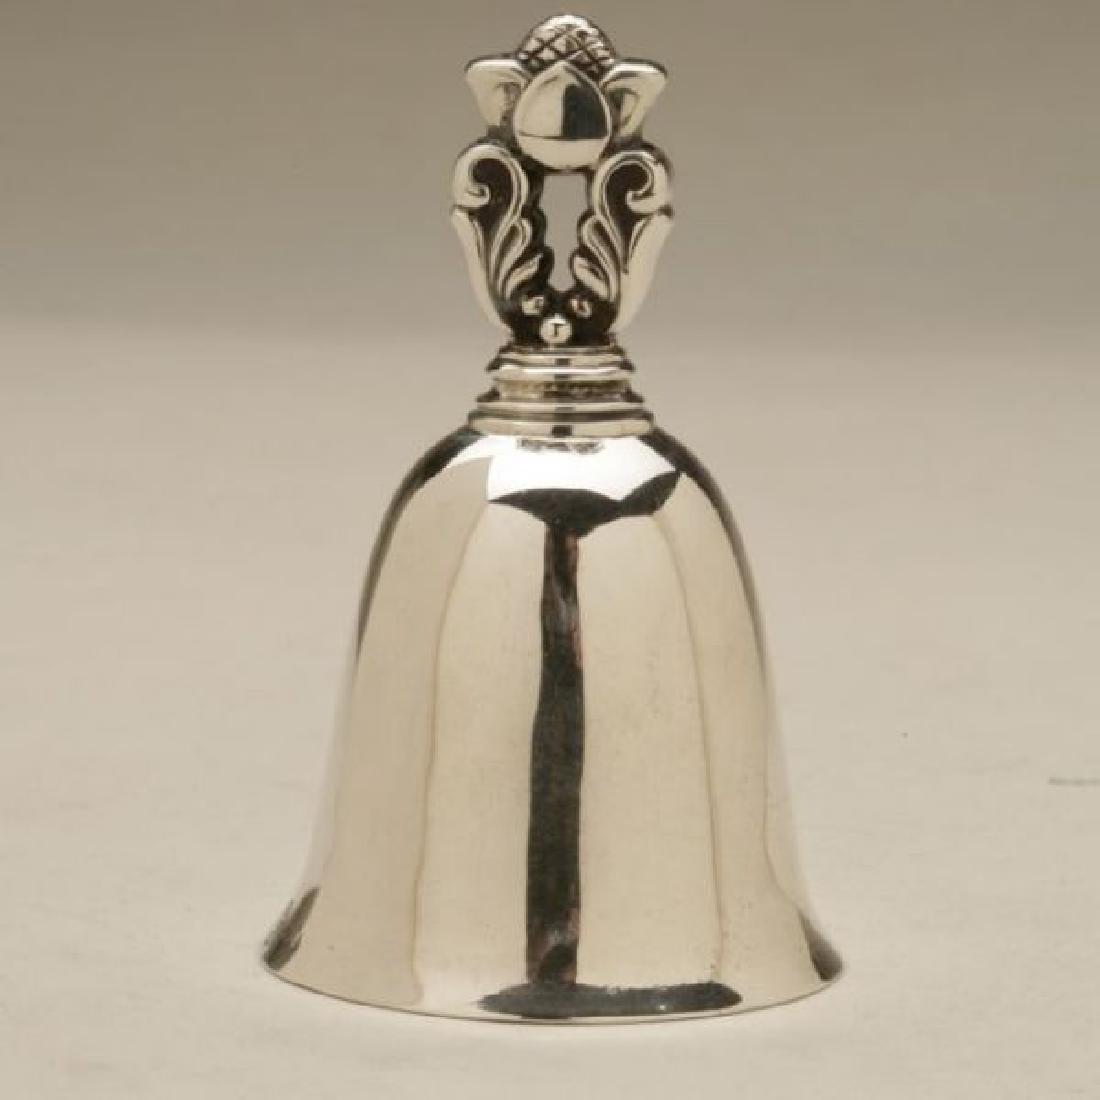 Georg Jensen Sterling Silver Acorn Table Bell, 1925-32